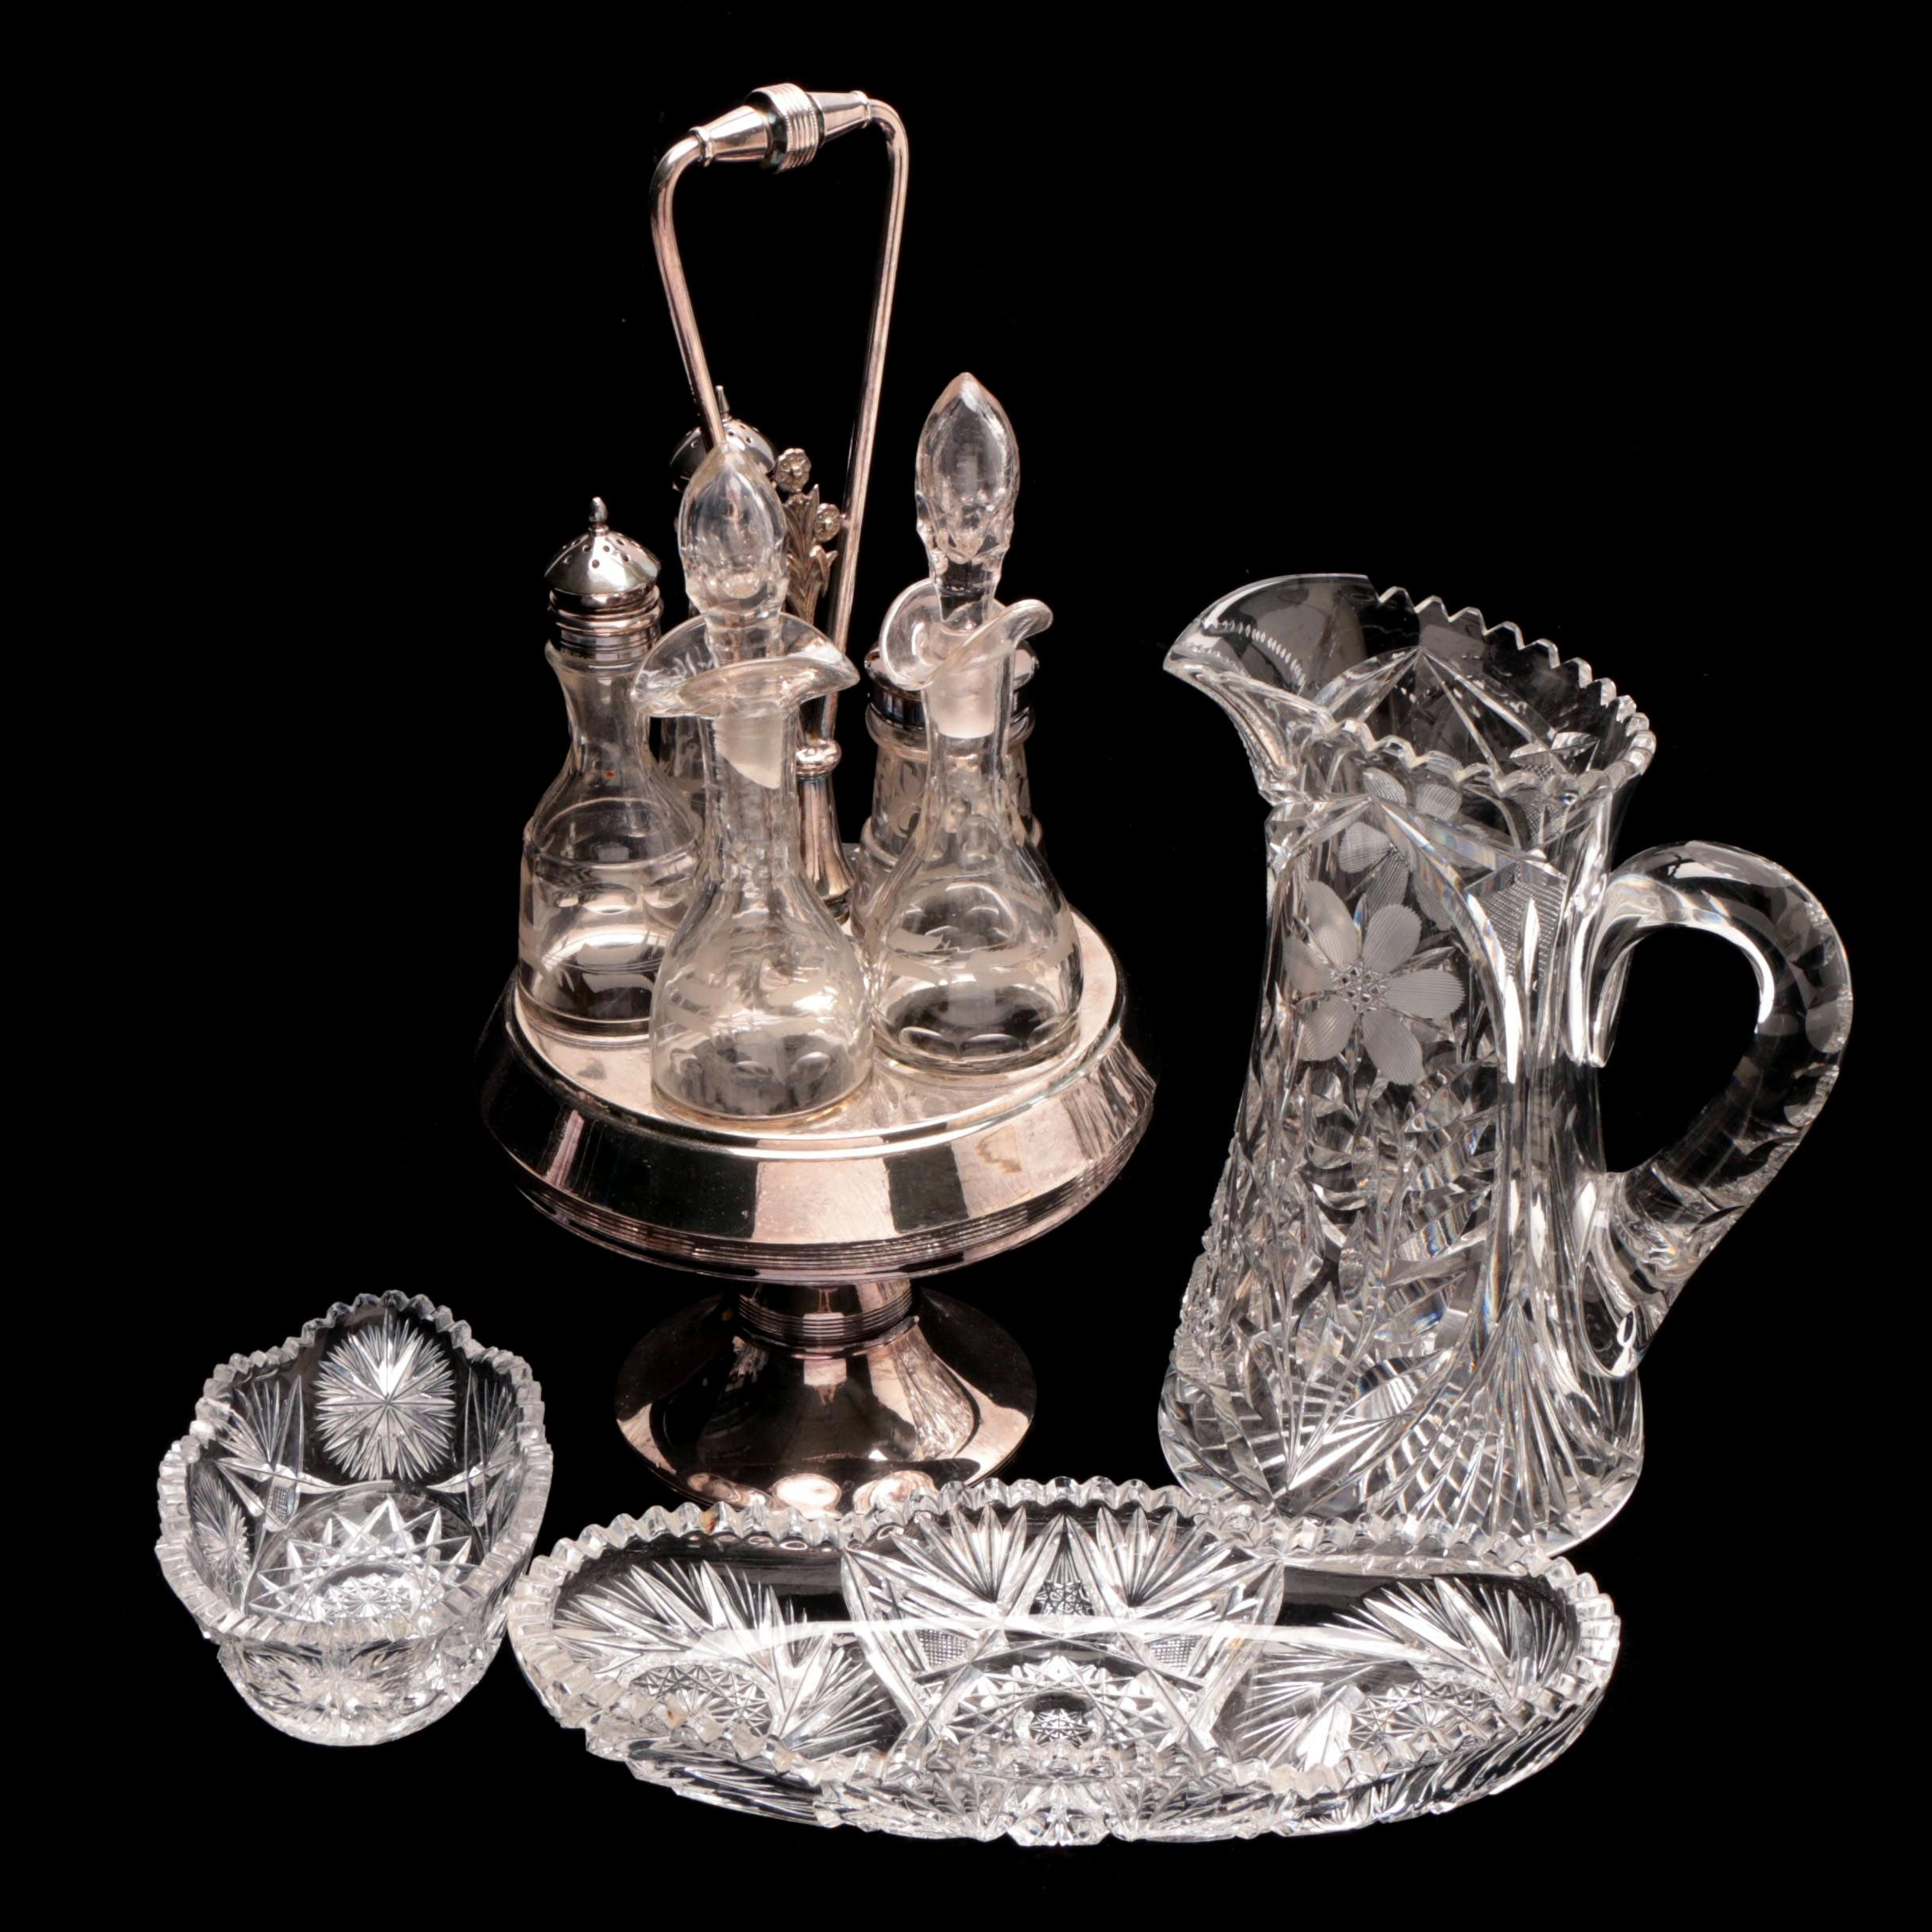 Circa Early 20th Century Crystal Serveware and Silver Plate Cruet Set